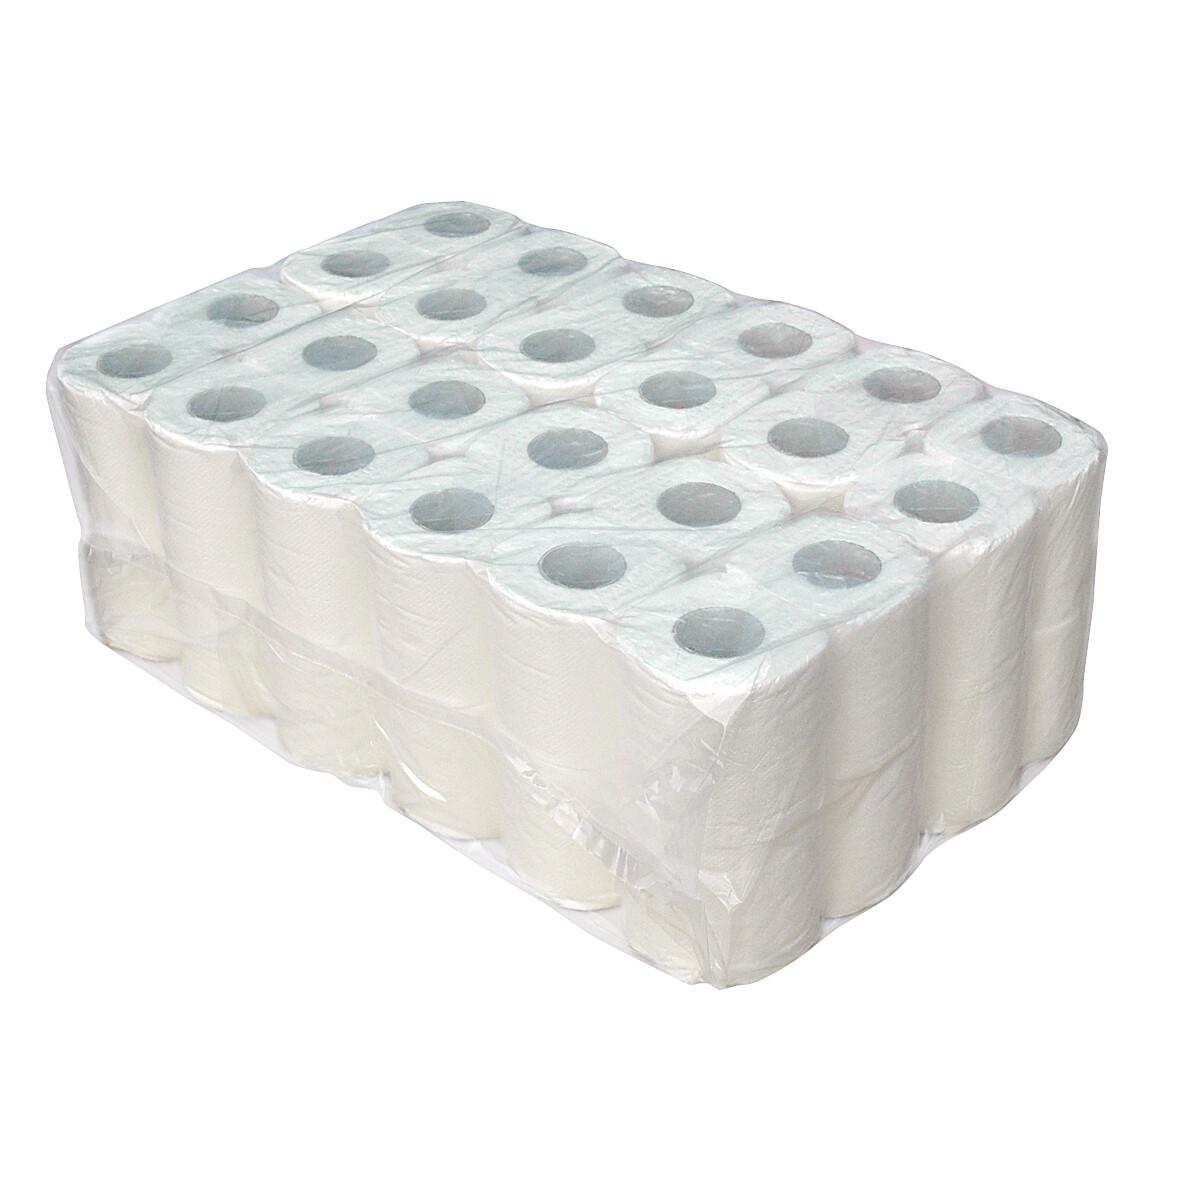 P50629 Euro tissue 100% cellulose 2-laags toiletpapier, pak van 48 rollen